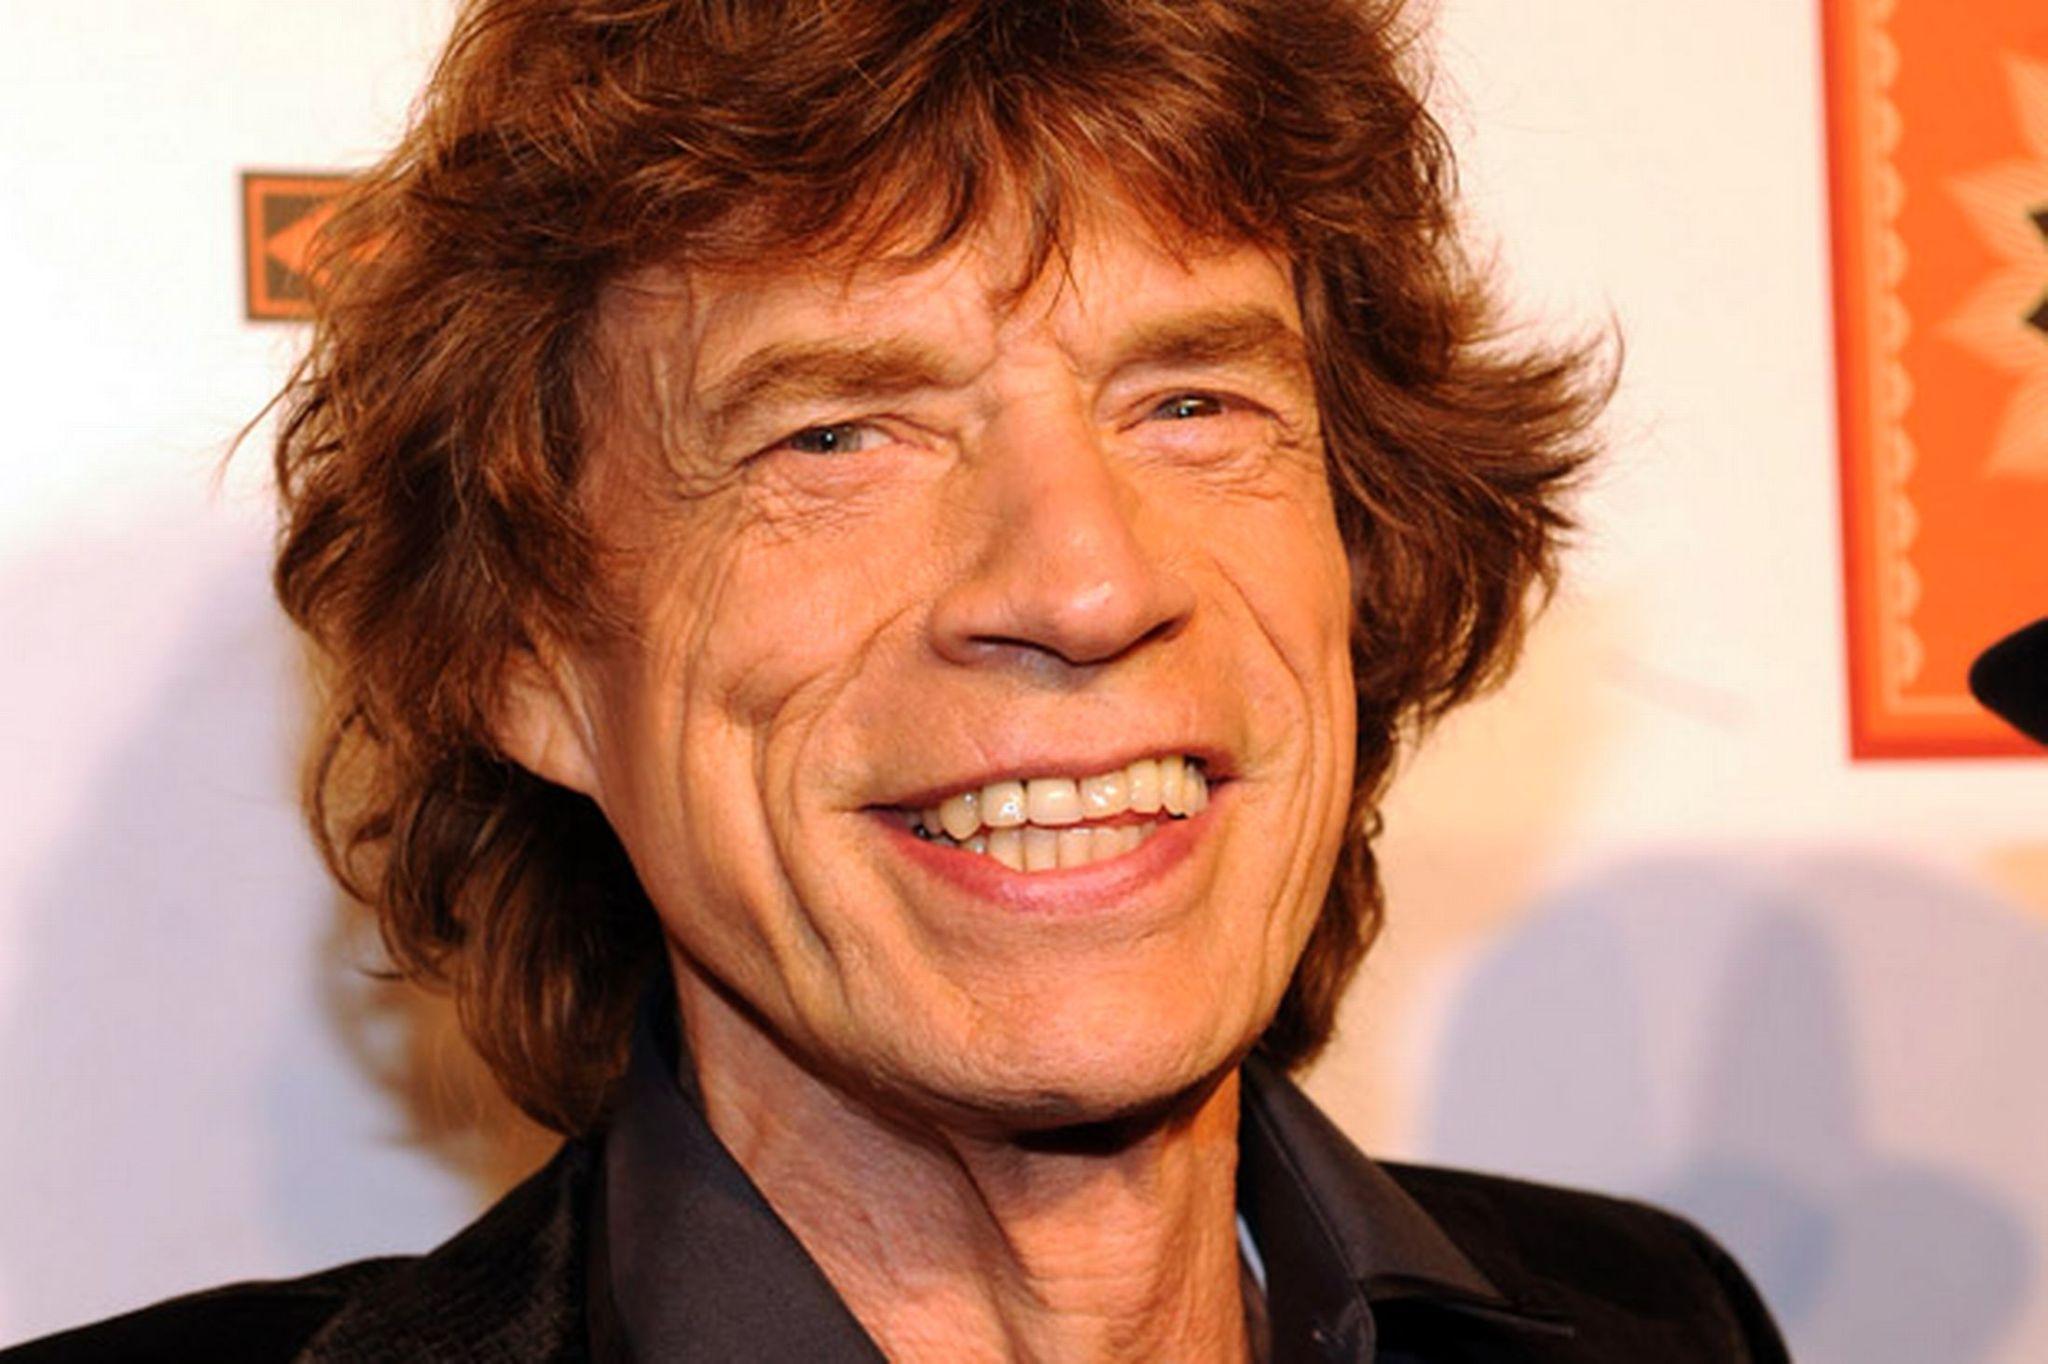 Mick Jagger Hd Background